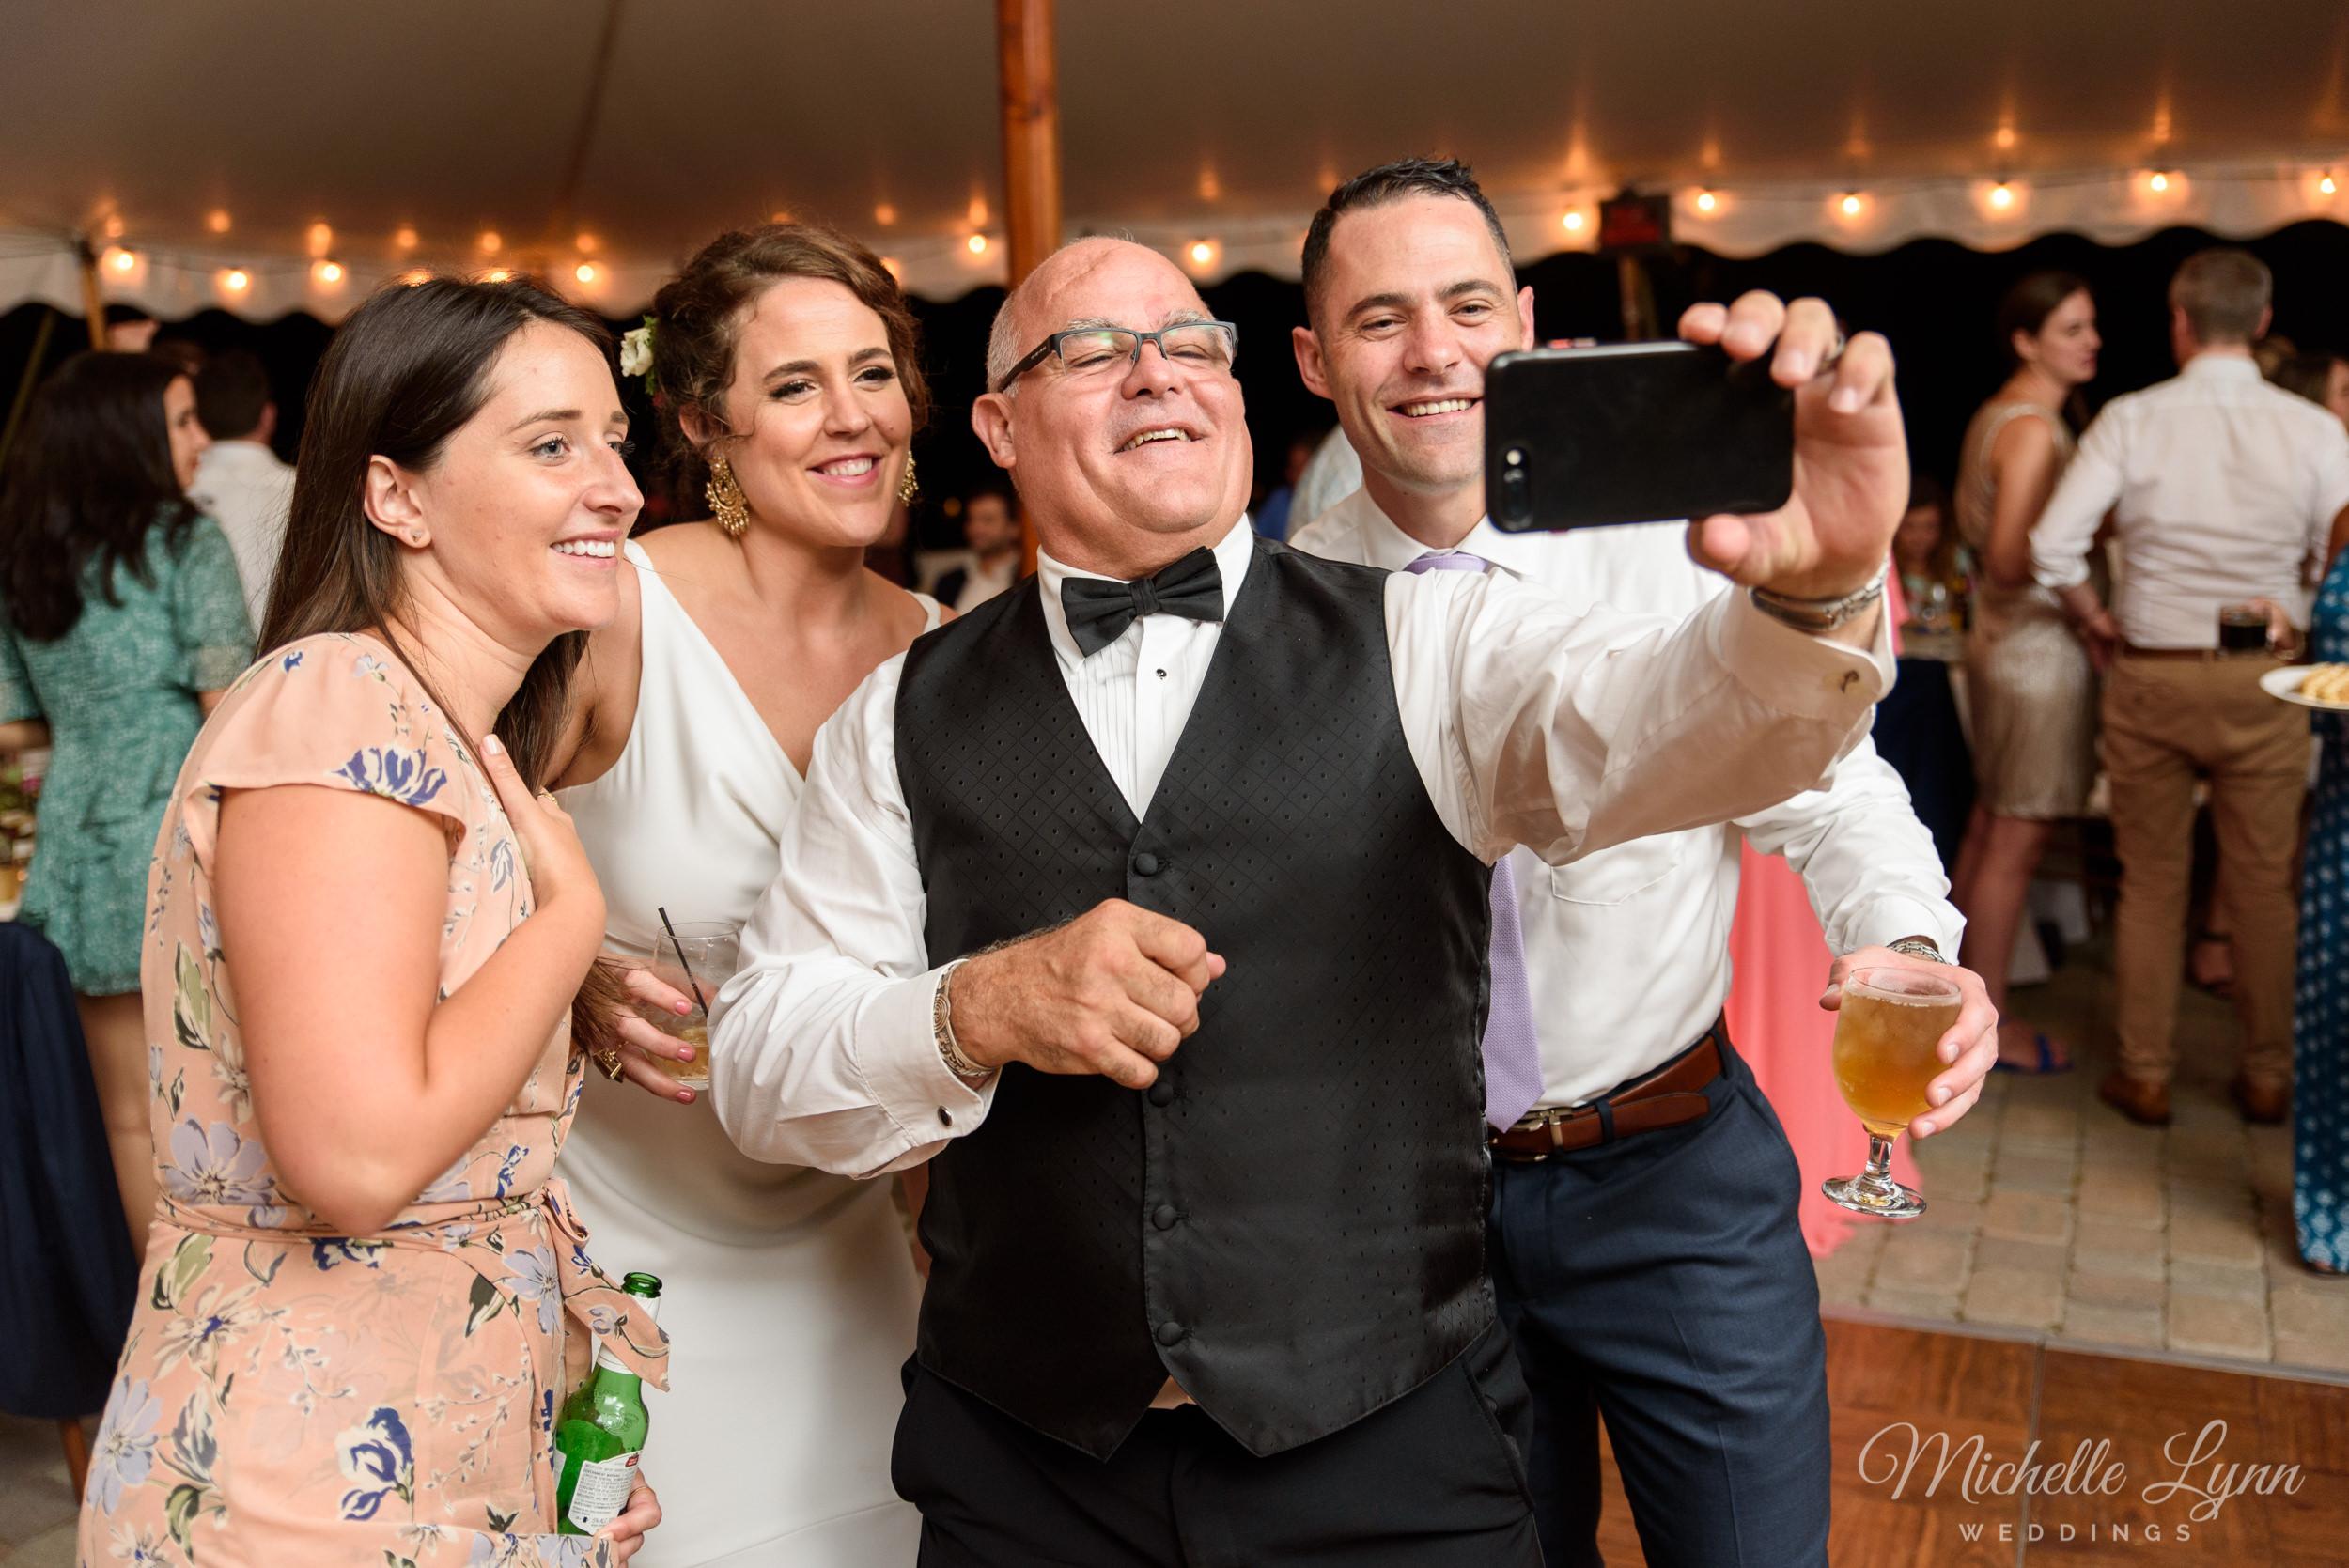 mlw-unionville-vineyards-nj-wedding-photography-105.jpg